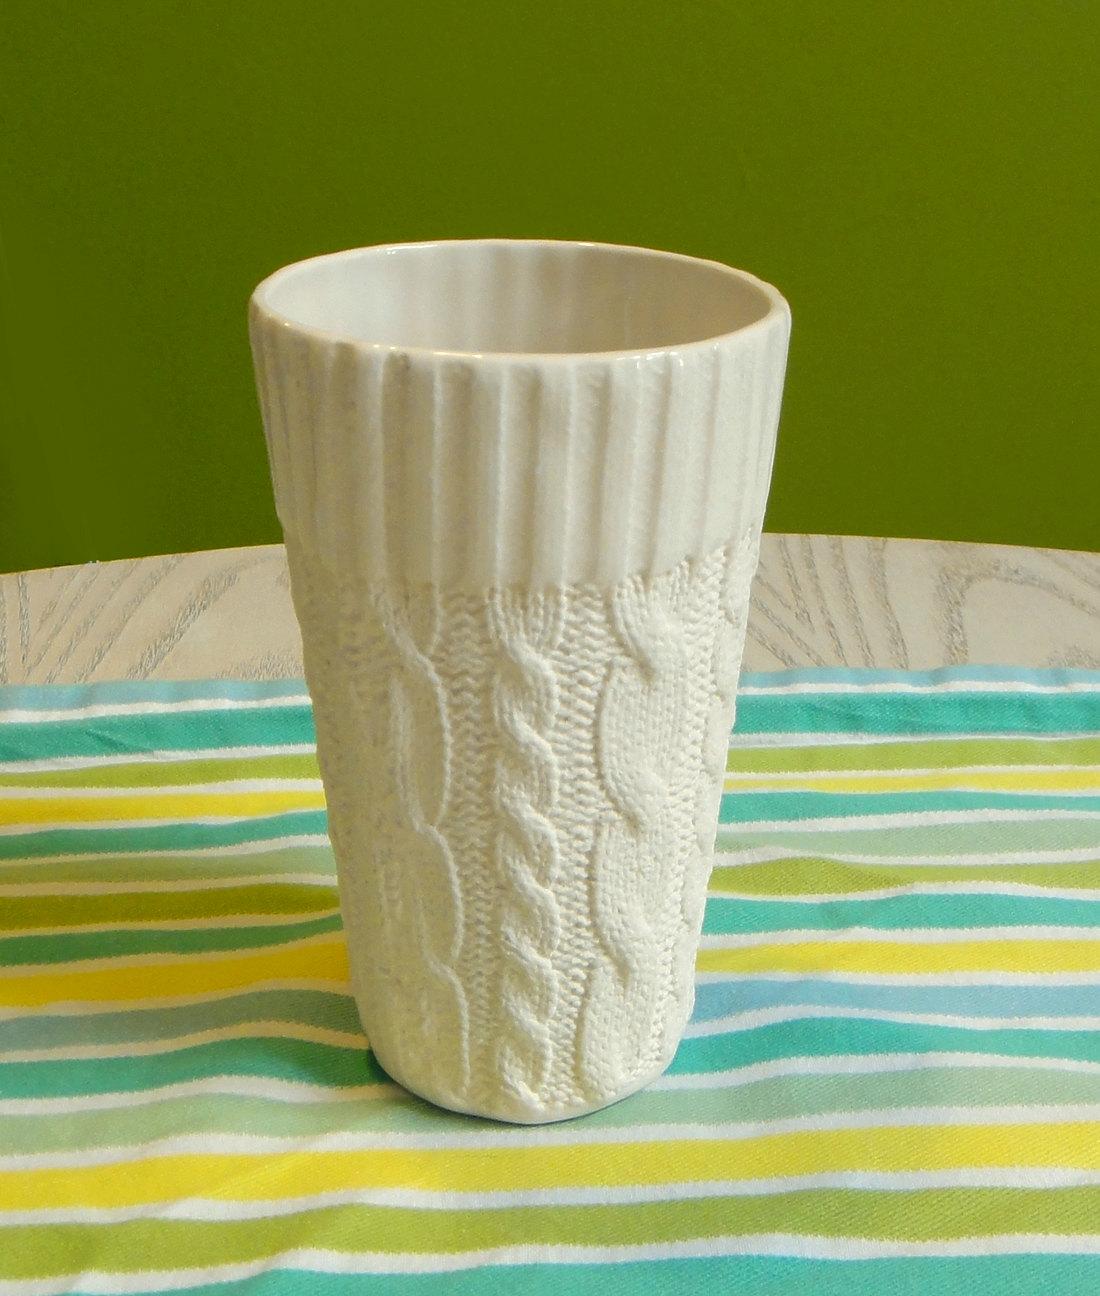 Entirely ceramic.